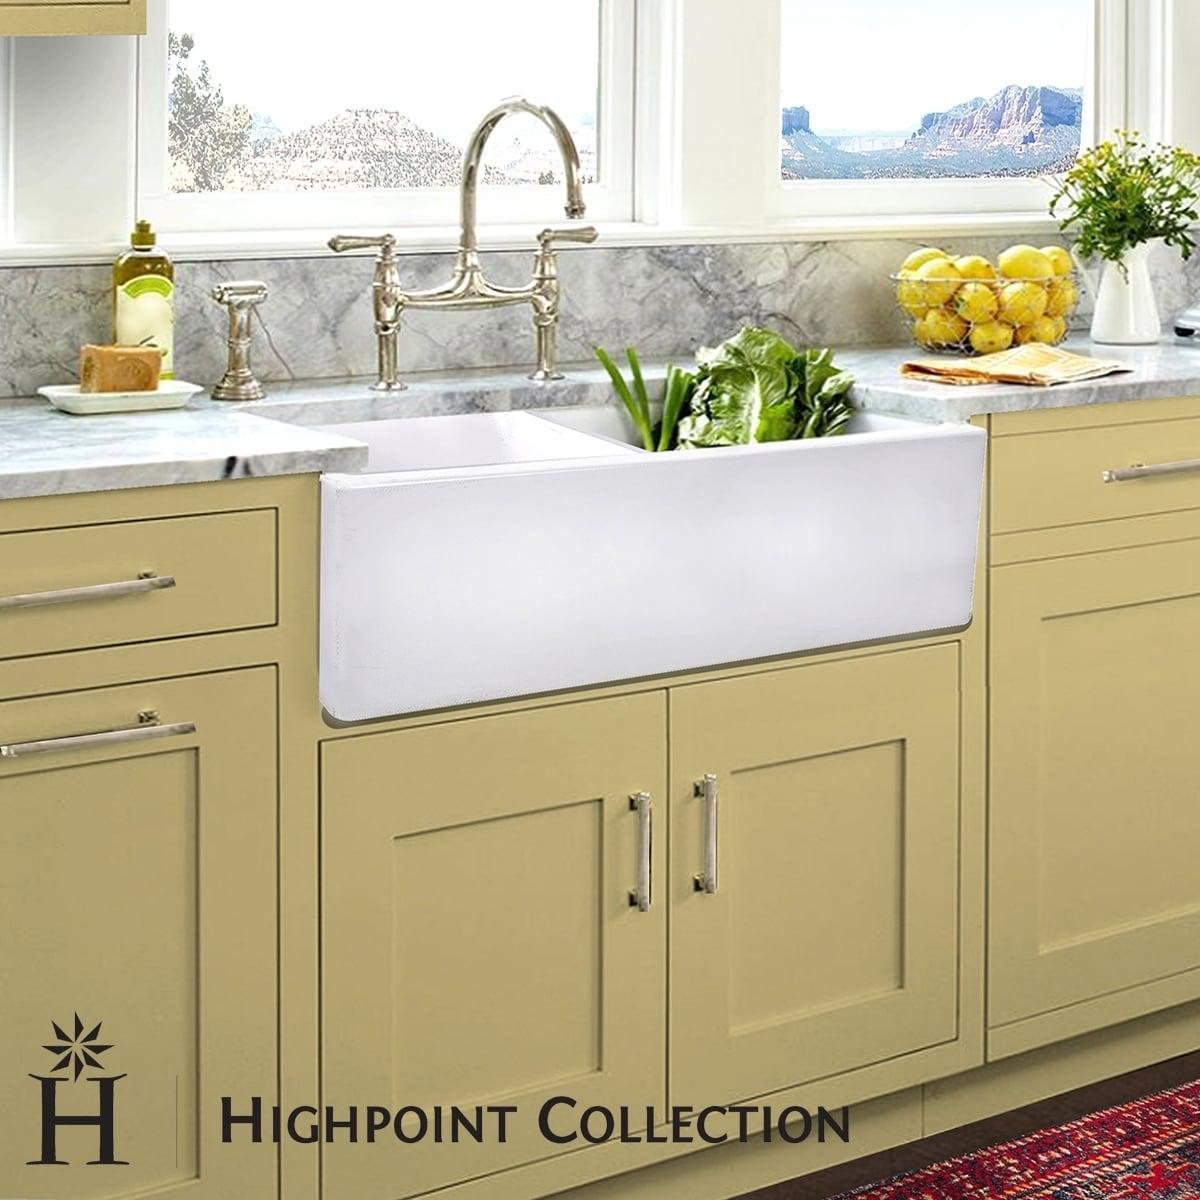 Highpoint Collection Italian Fireclay Double Bowl Farmhouse Sink - 33\